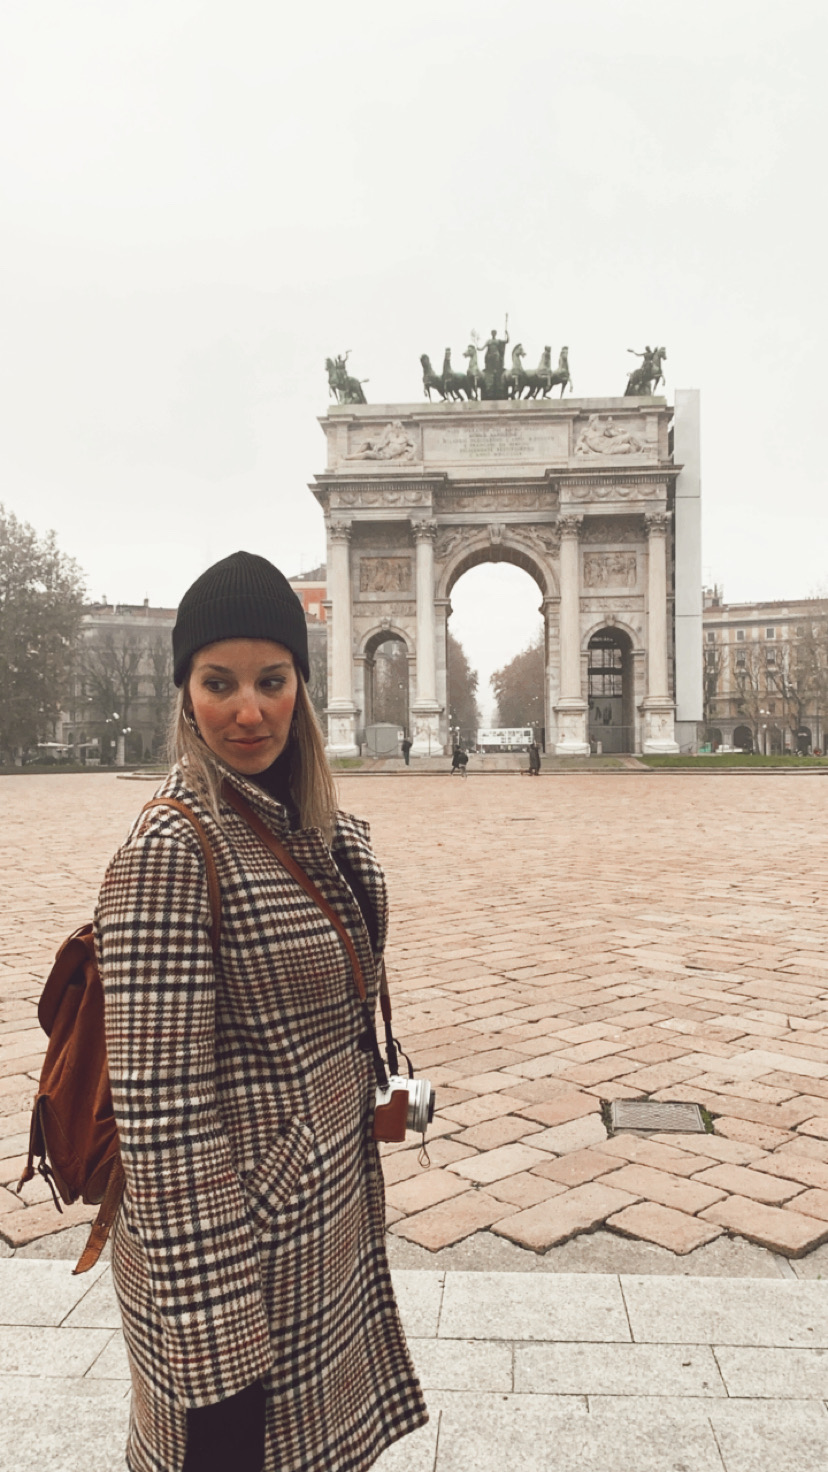 Arco de La Paz, Milán